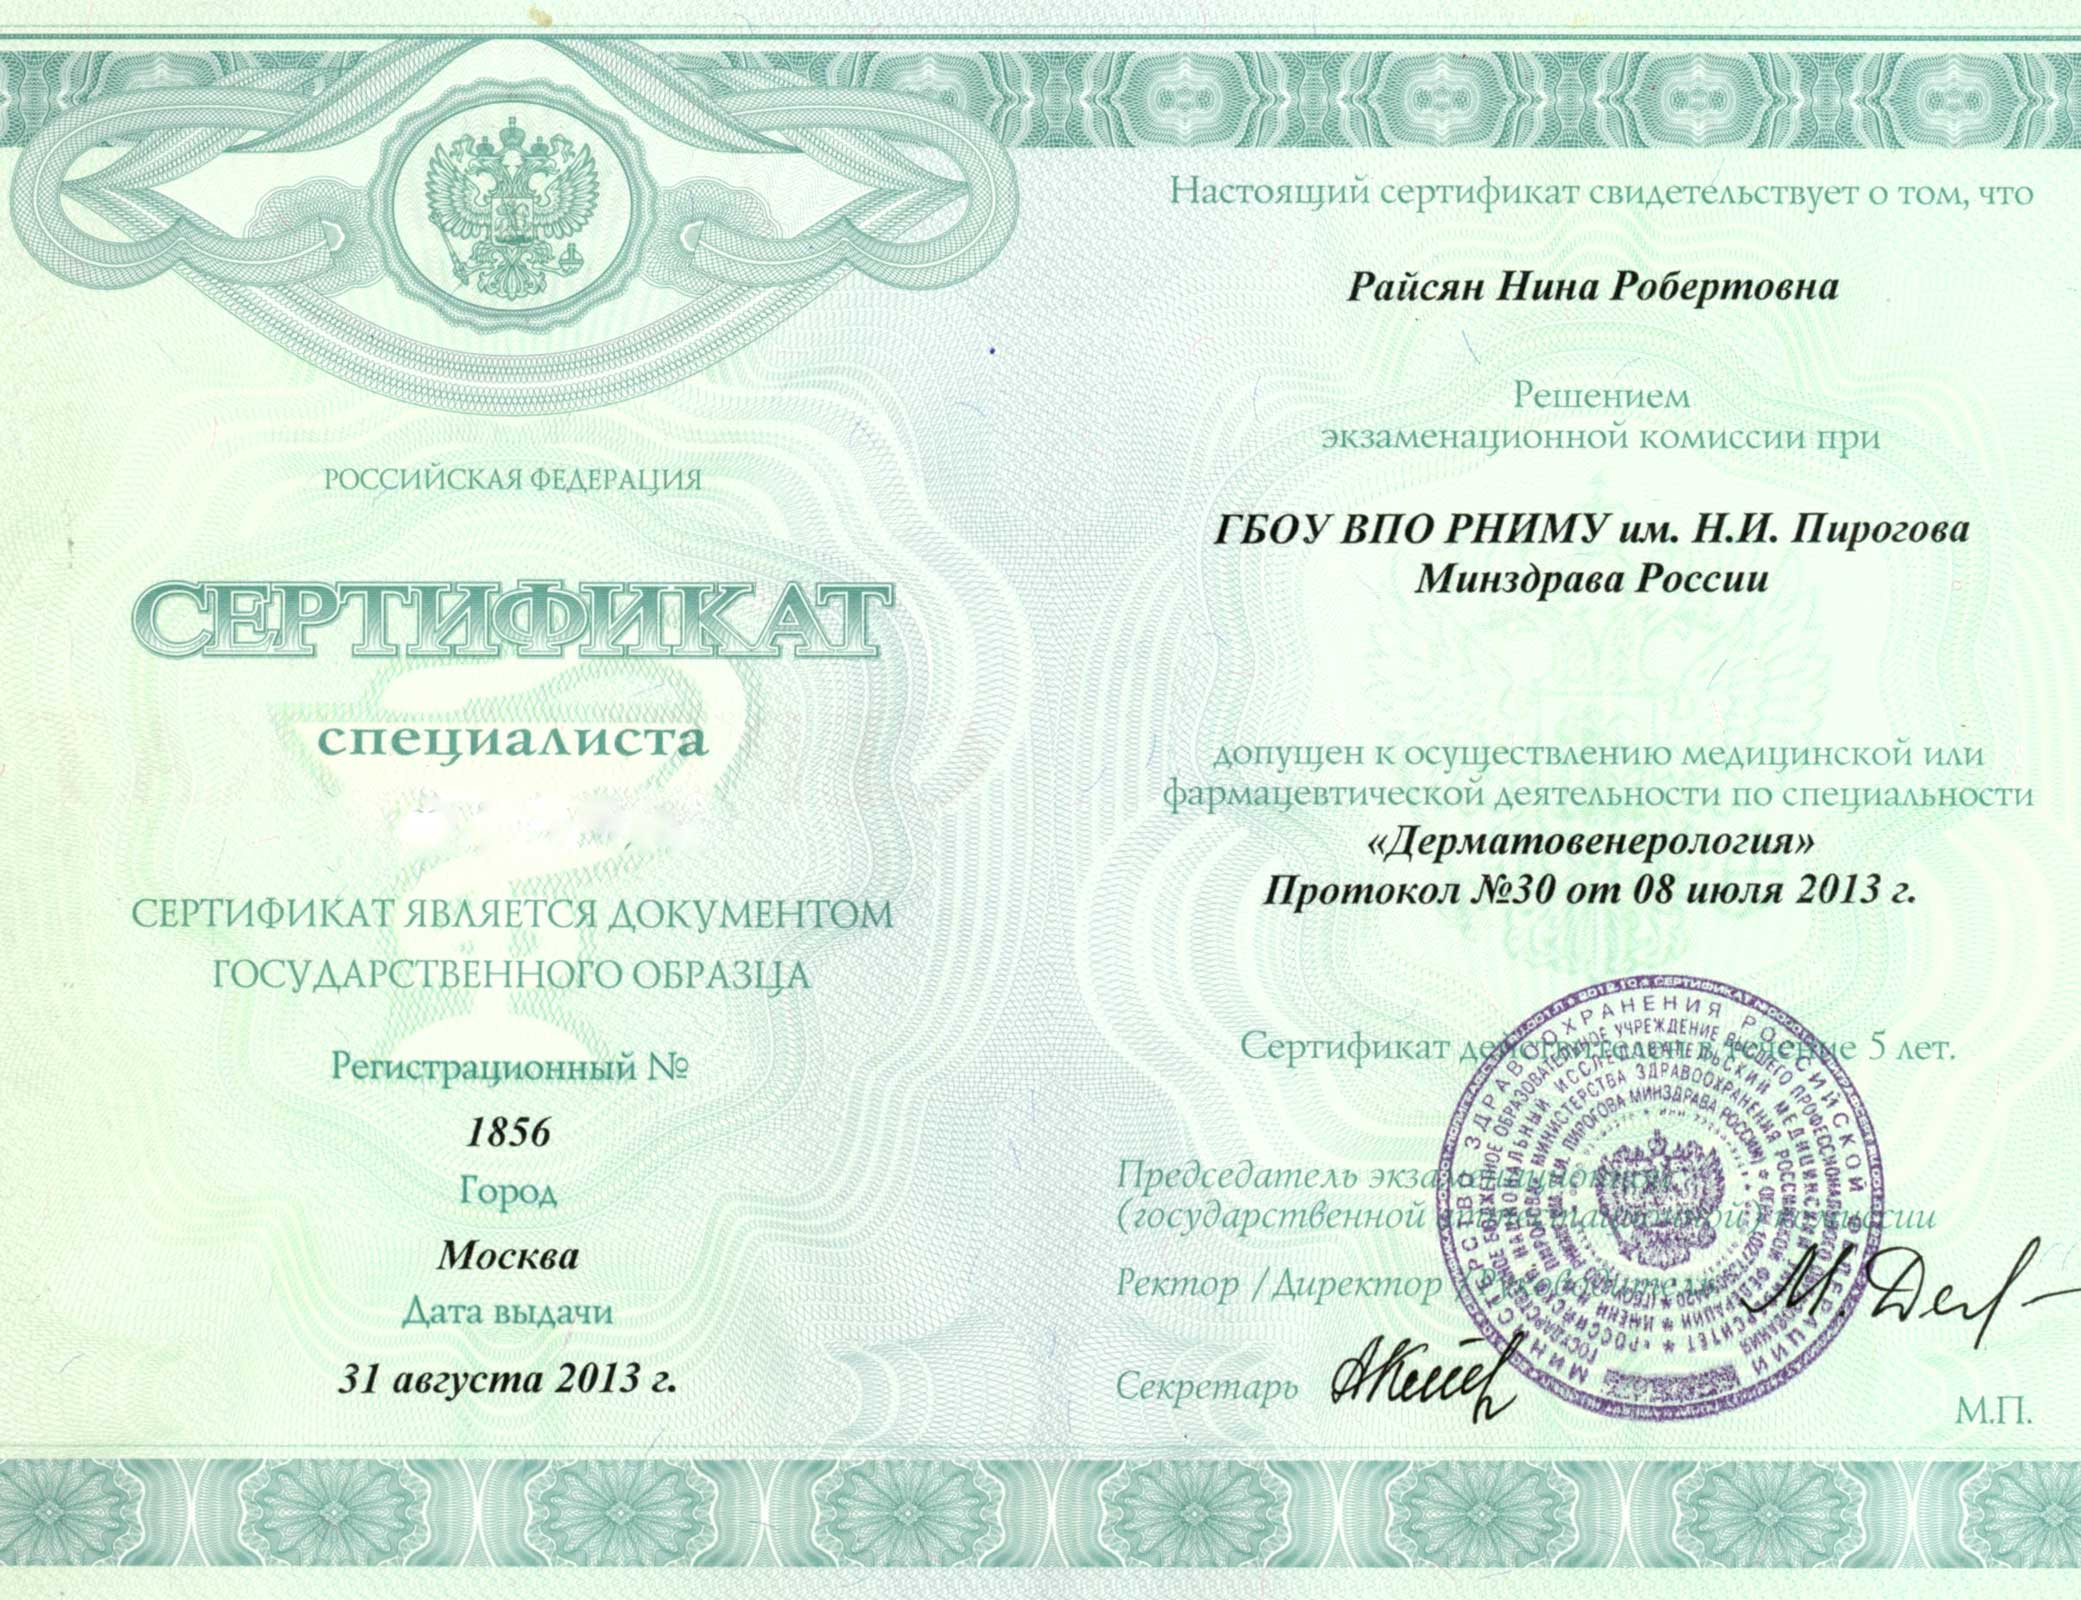 Сертификат специалиста врача-дерматовенеролога Райсян Н.Р.